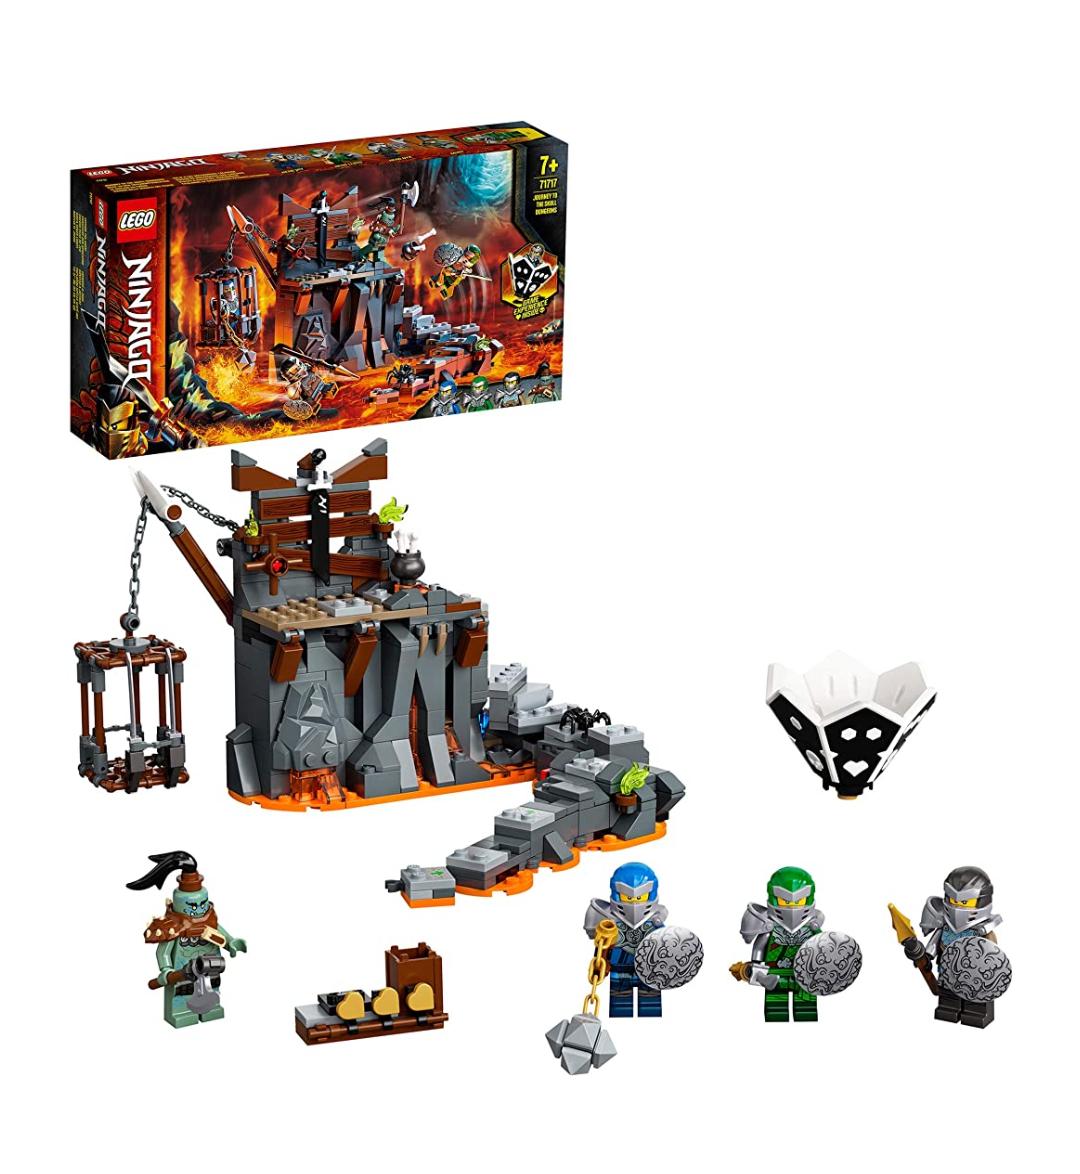 LEGO 71717 NINJAGO - Reise zu den Totenkopfverliesen, 2 in 1 Set Prime